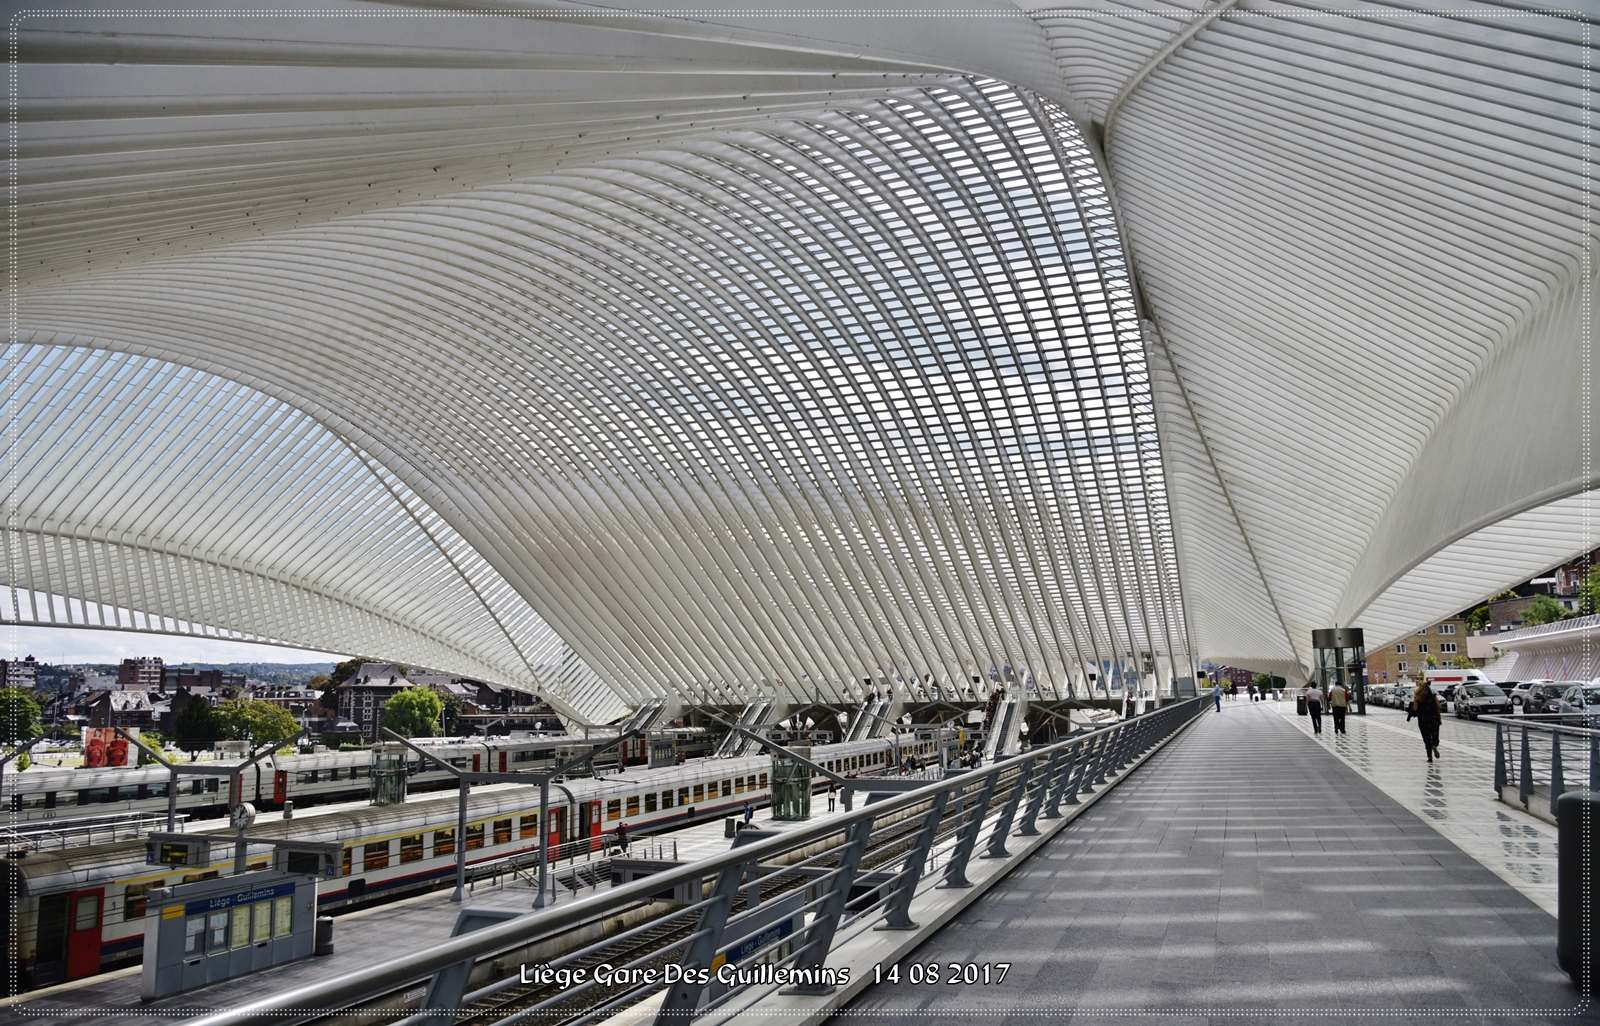 gare des guillemins Liege Guillemins Railway Station by Santiago Calatrava